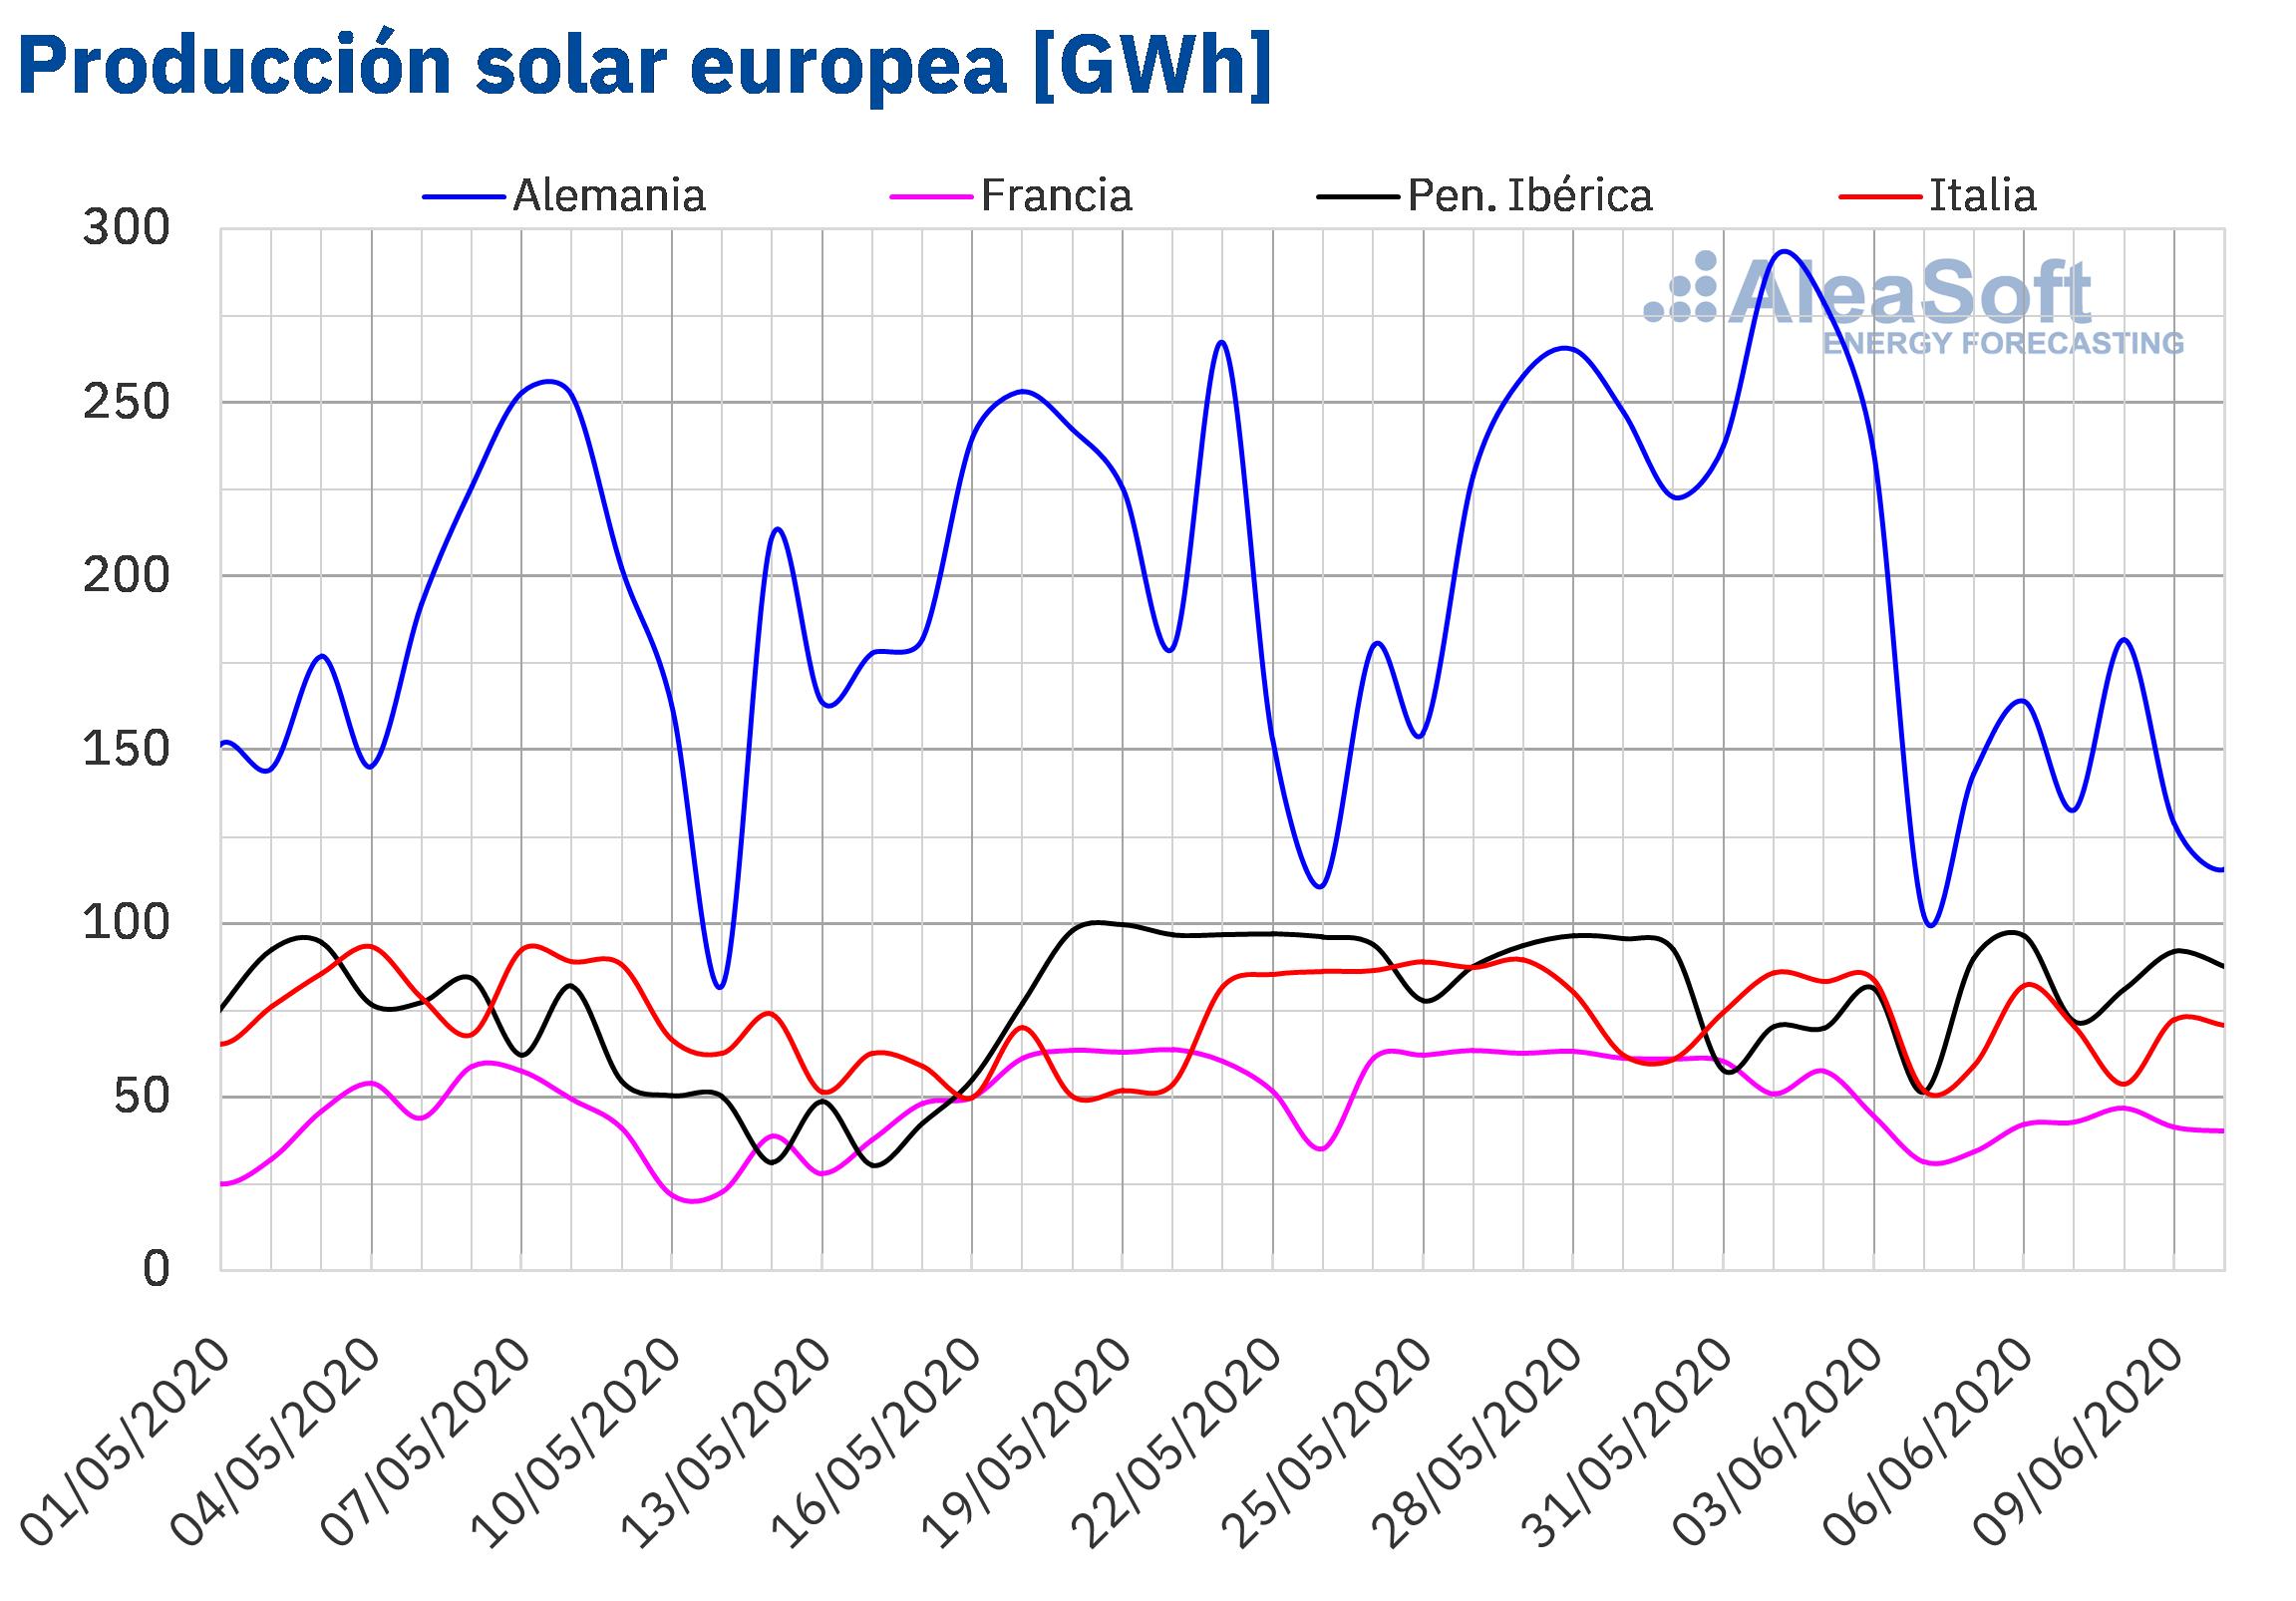 AleaSoft - Produccion solar fotovoltaica termosolar electricidad Europa